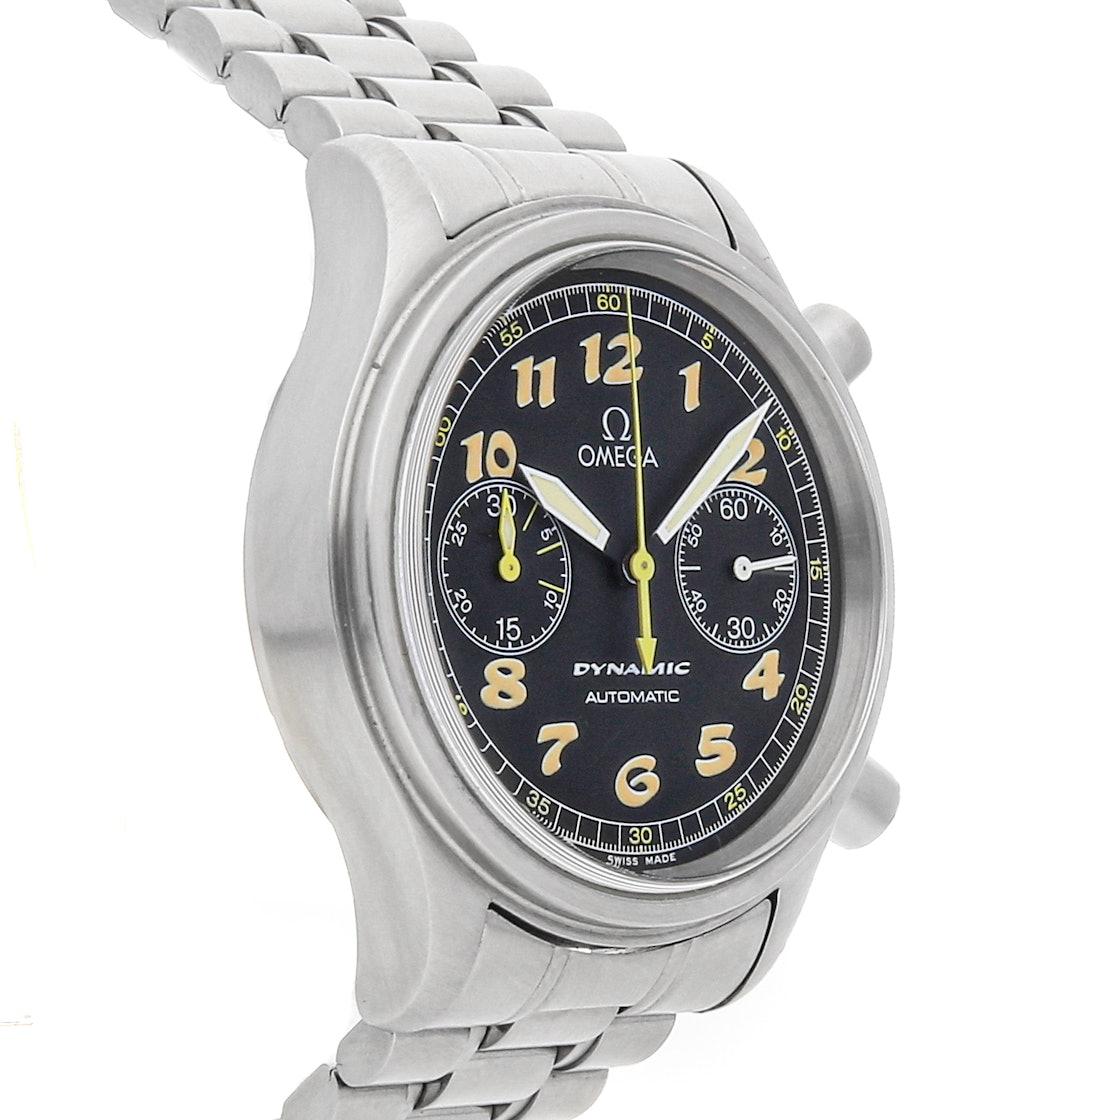 Omega Dynamic Chronograph III 5240.50.00